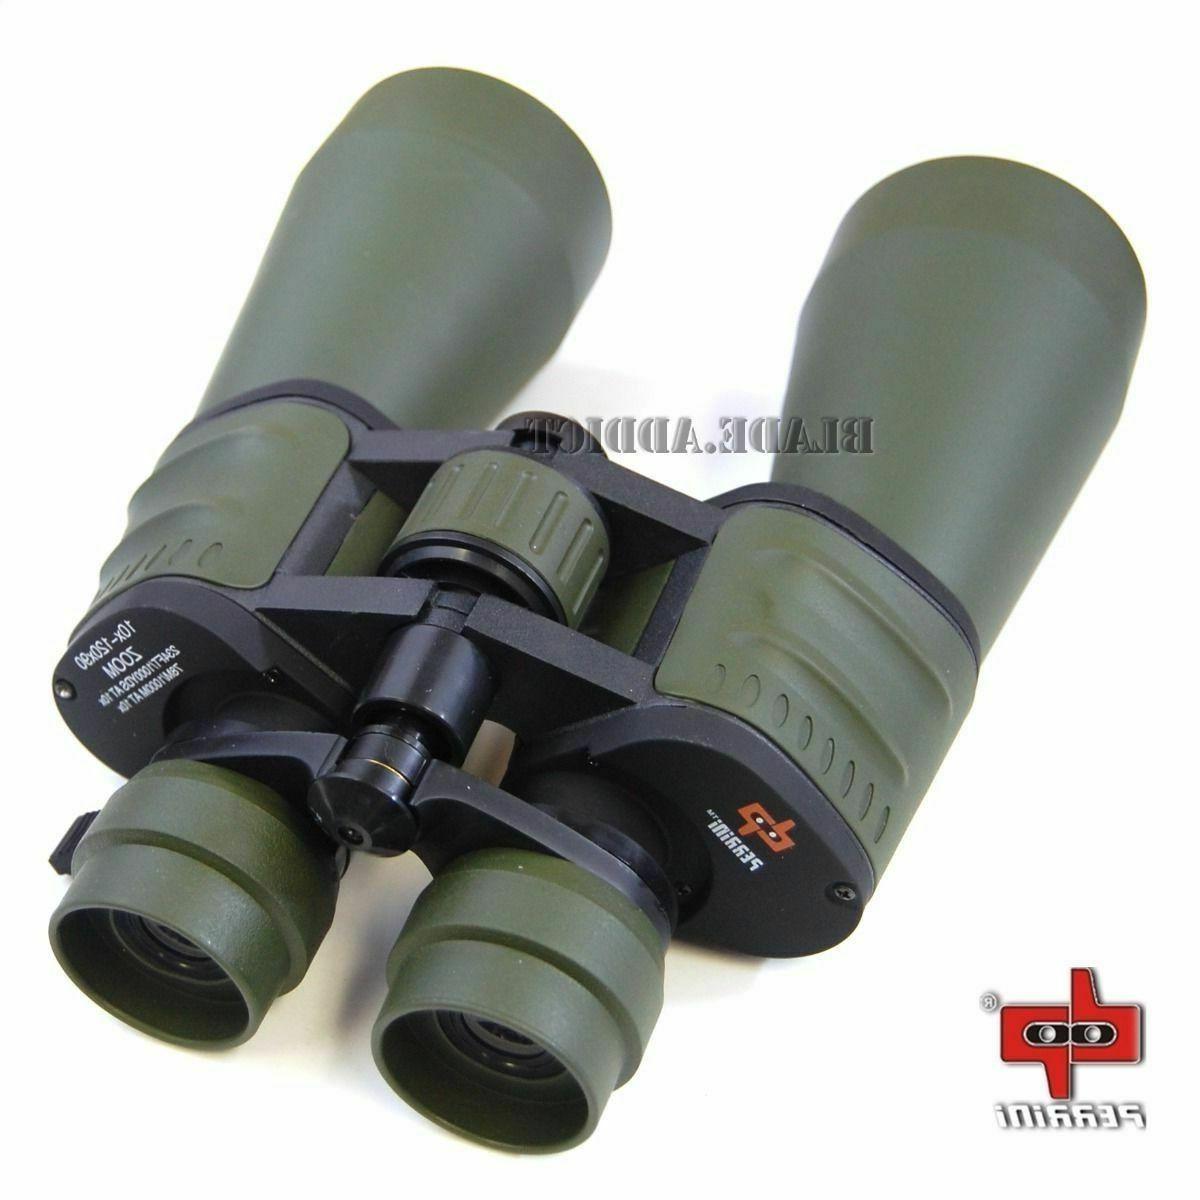 10x 120x90 huge military power zoom binoculars